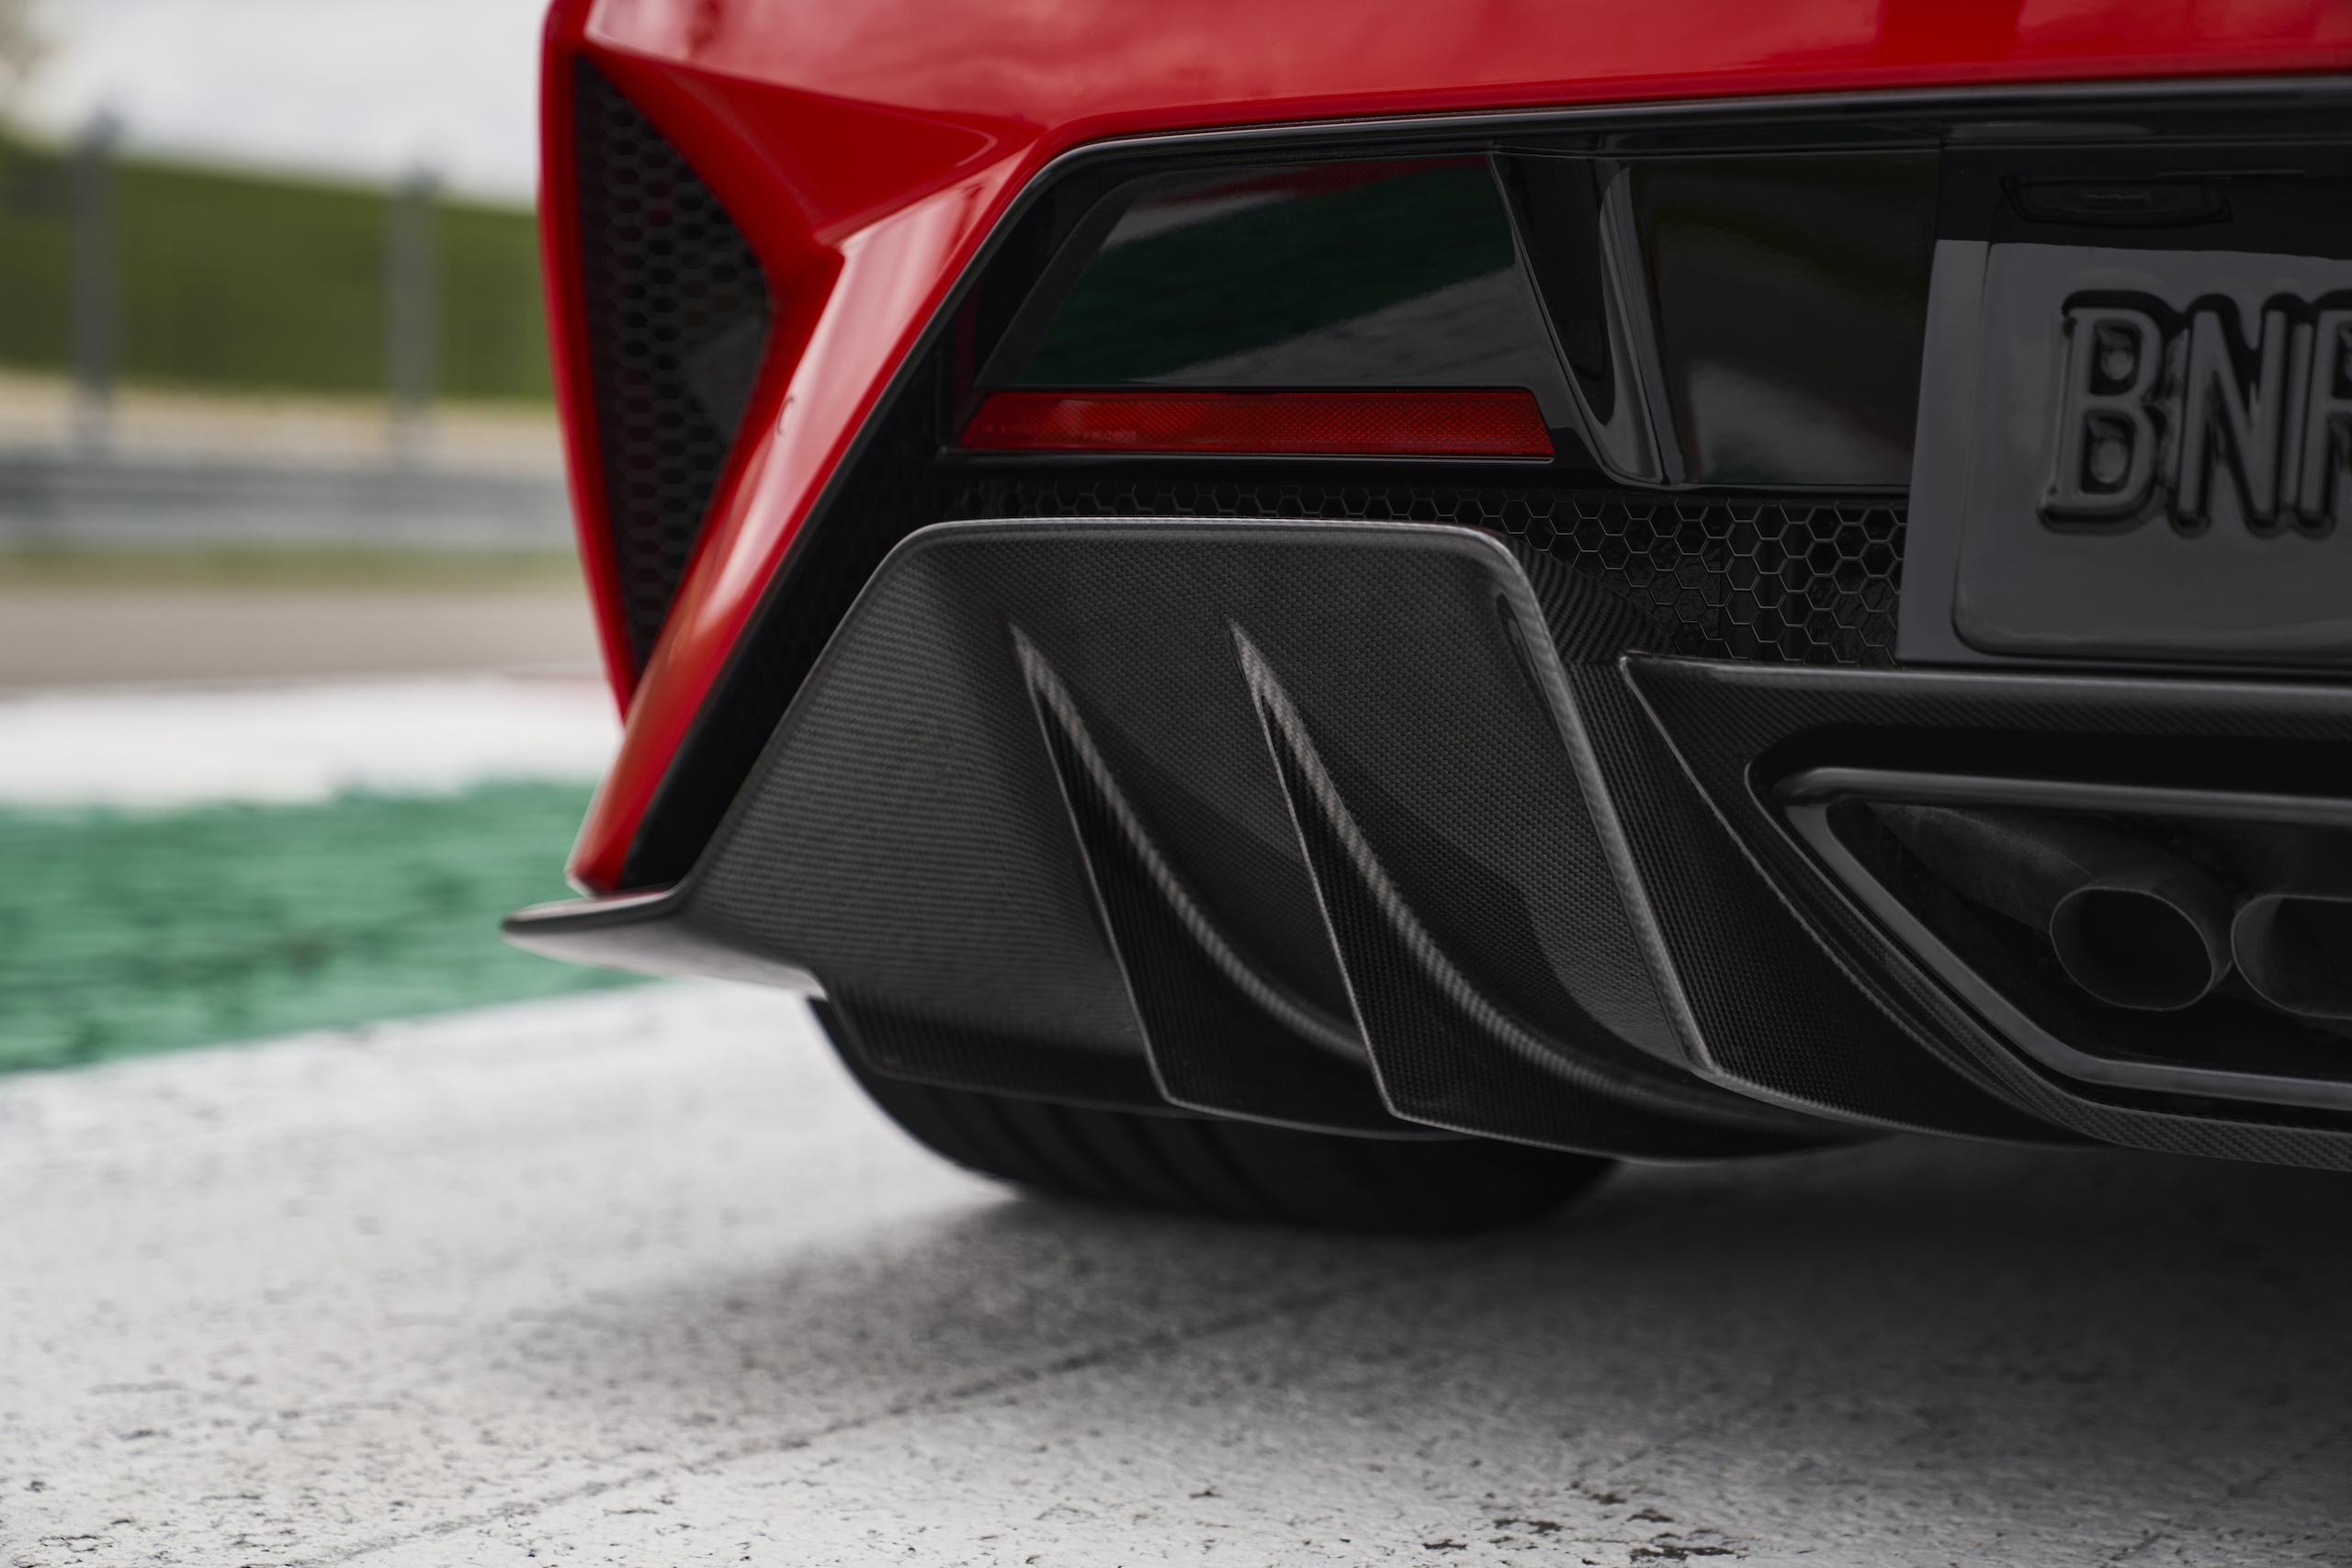 2022 Acura NSX Type S rear carbon fiber aerodynamics